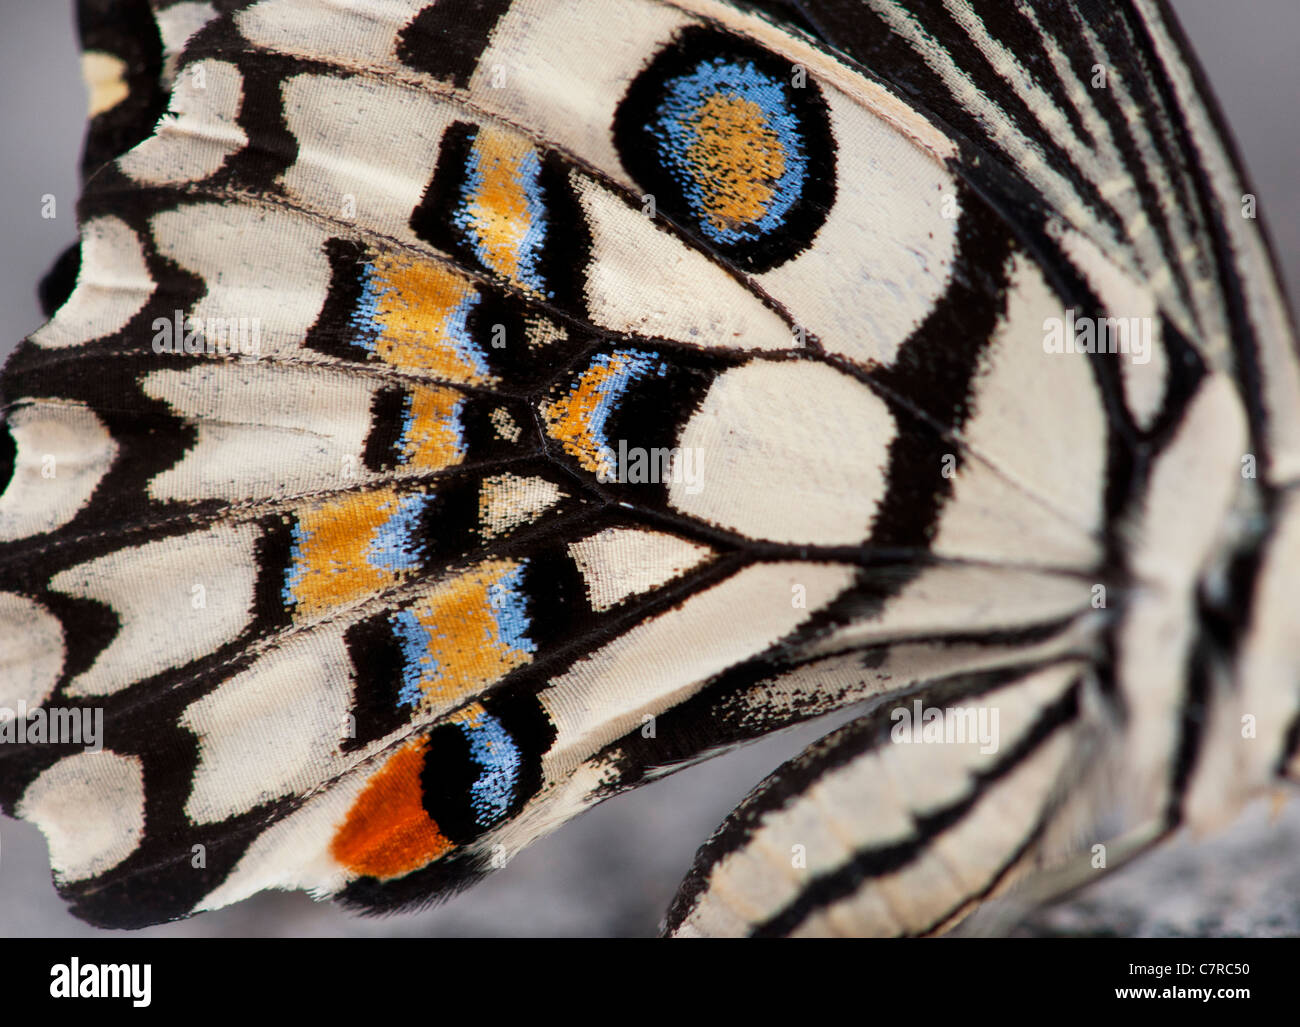 Papilio demoleus . Lime butterfly wing pattern - Stock Image